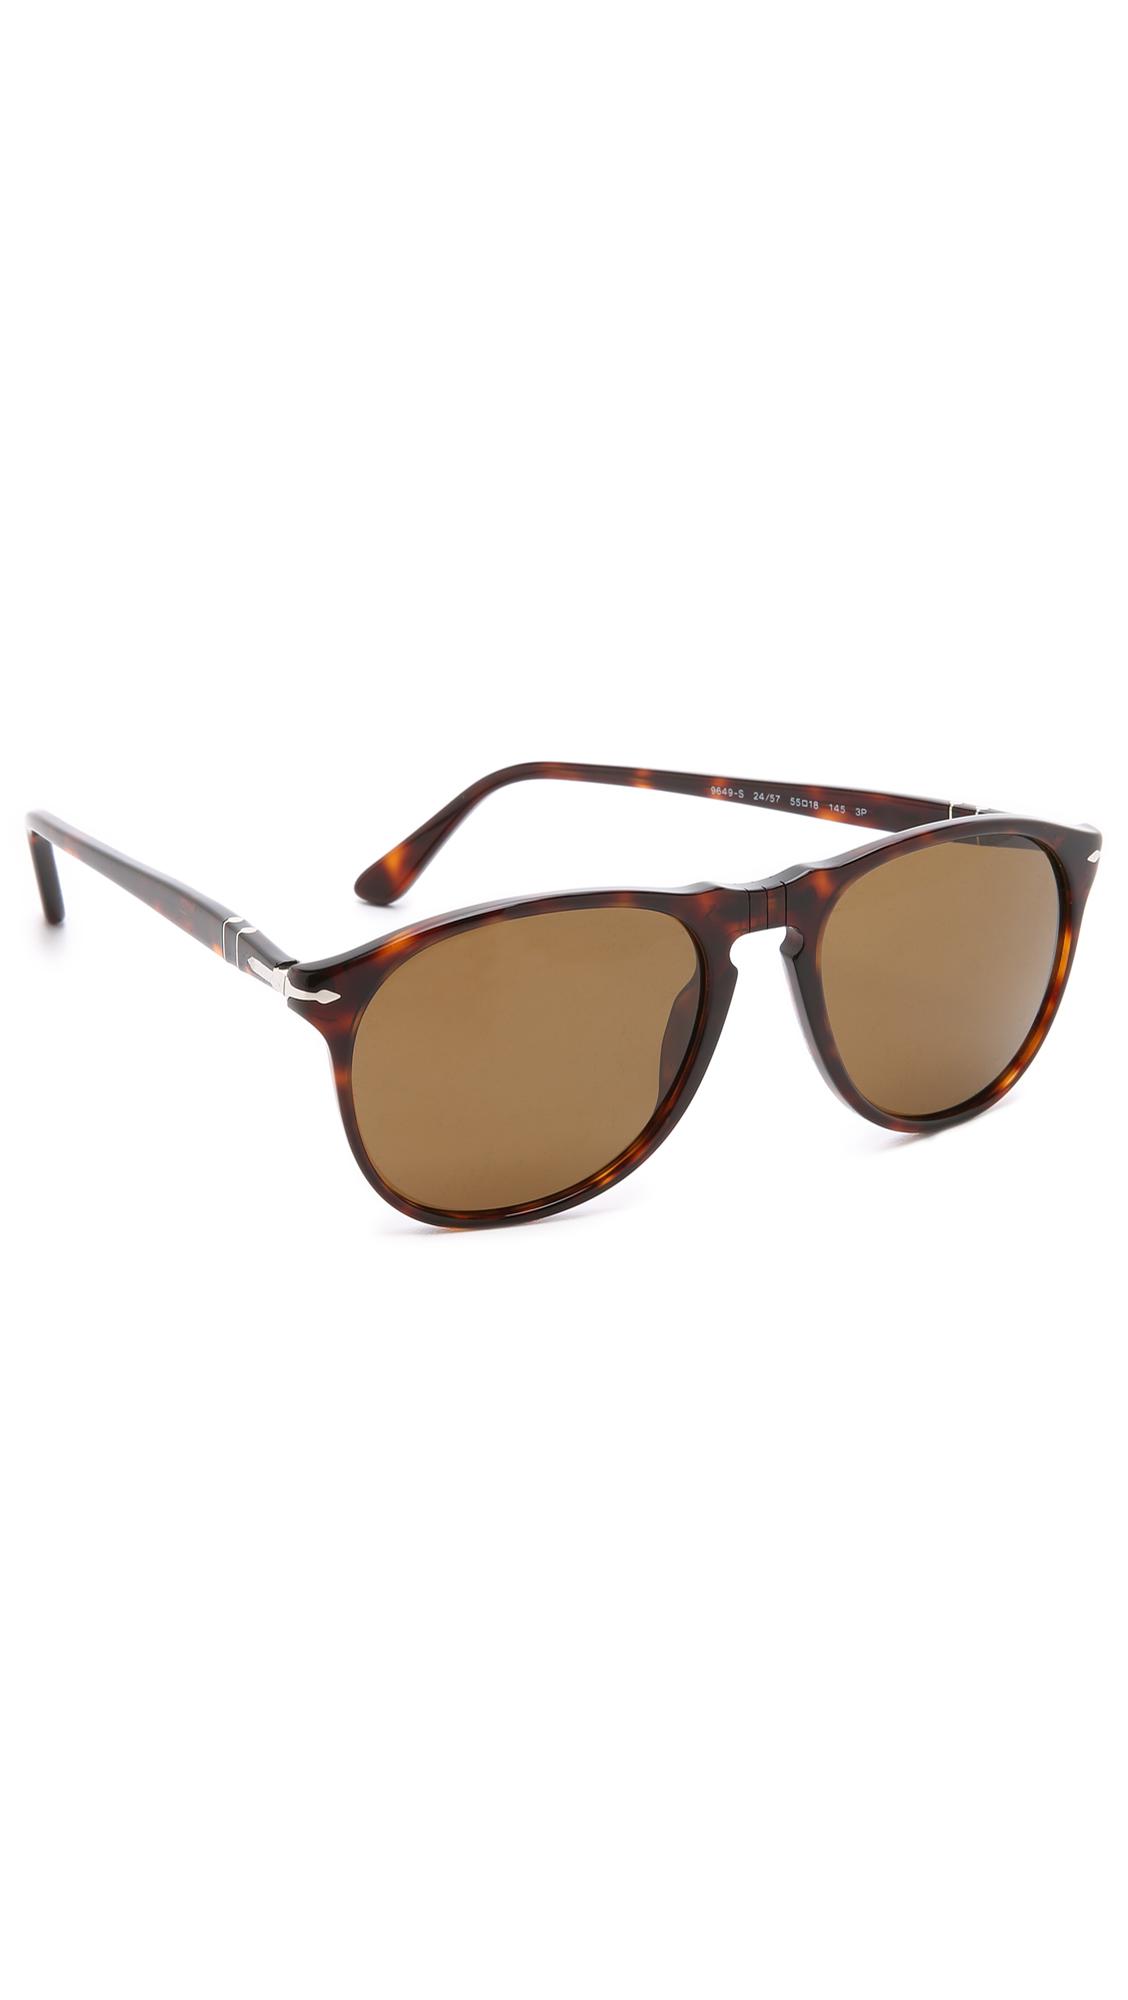 c00090255c Persol Polarized Classic Sunglasses In Havana Brown Polar ...